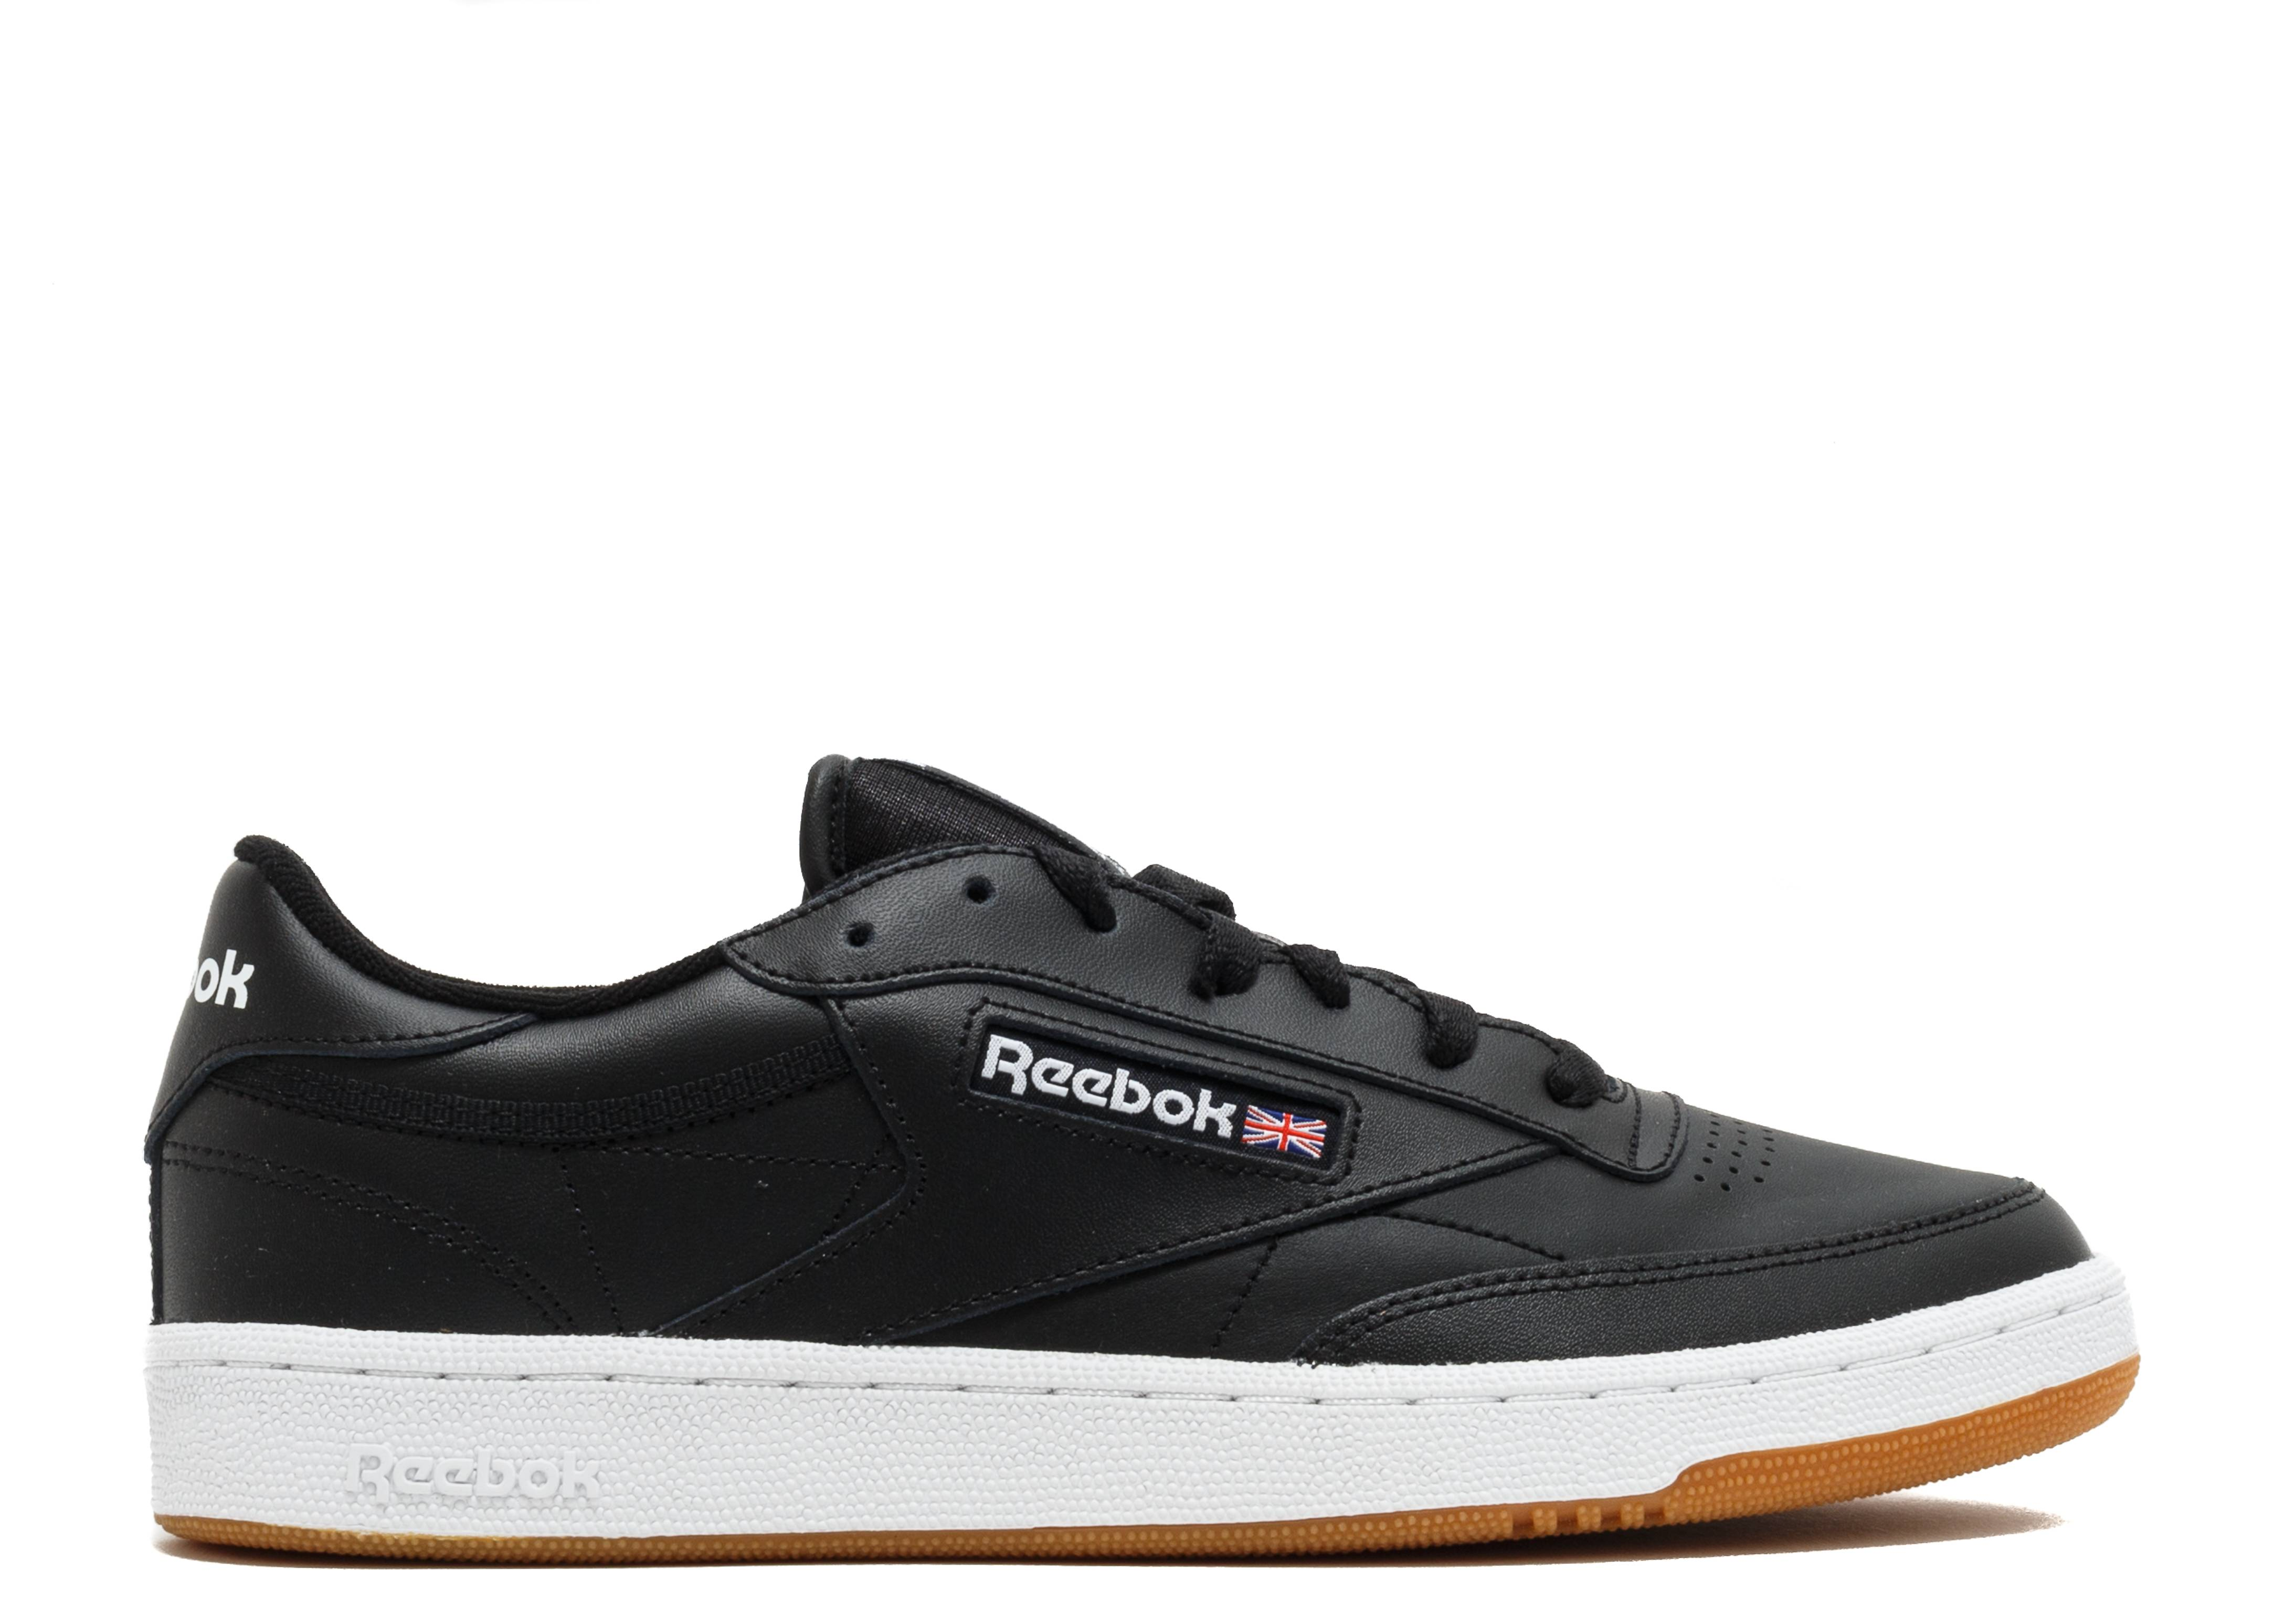 8dd278bd Reebok Sneakers - Pump, Classic & High Tops | Flight Club